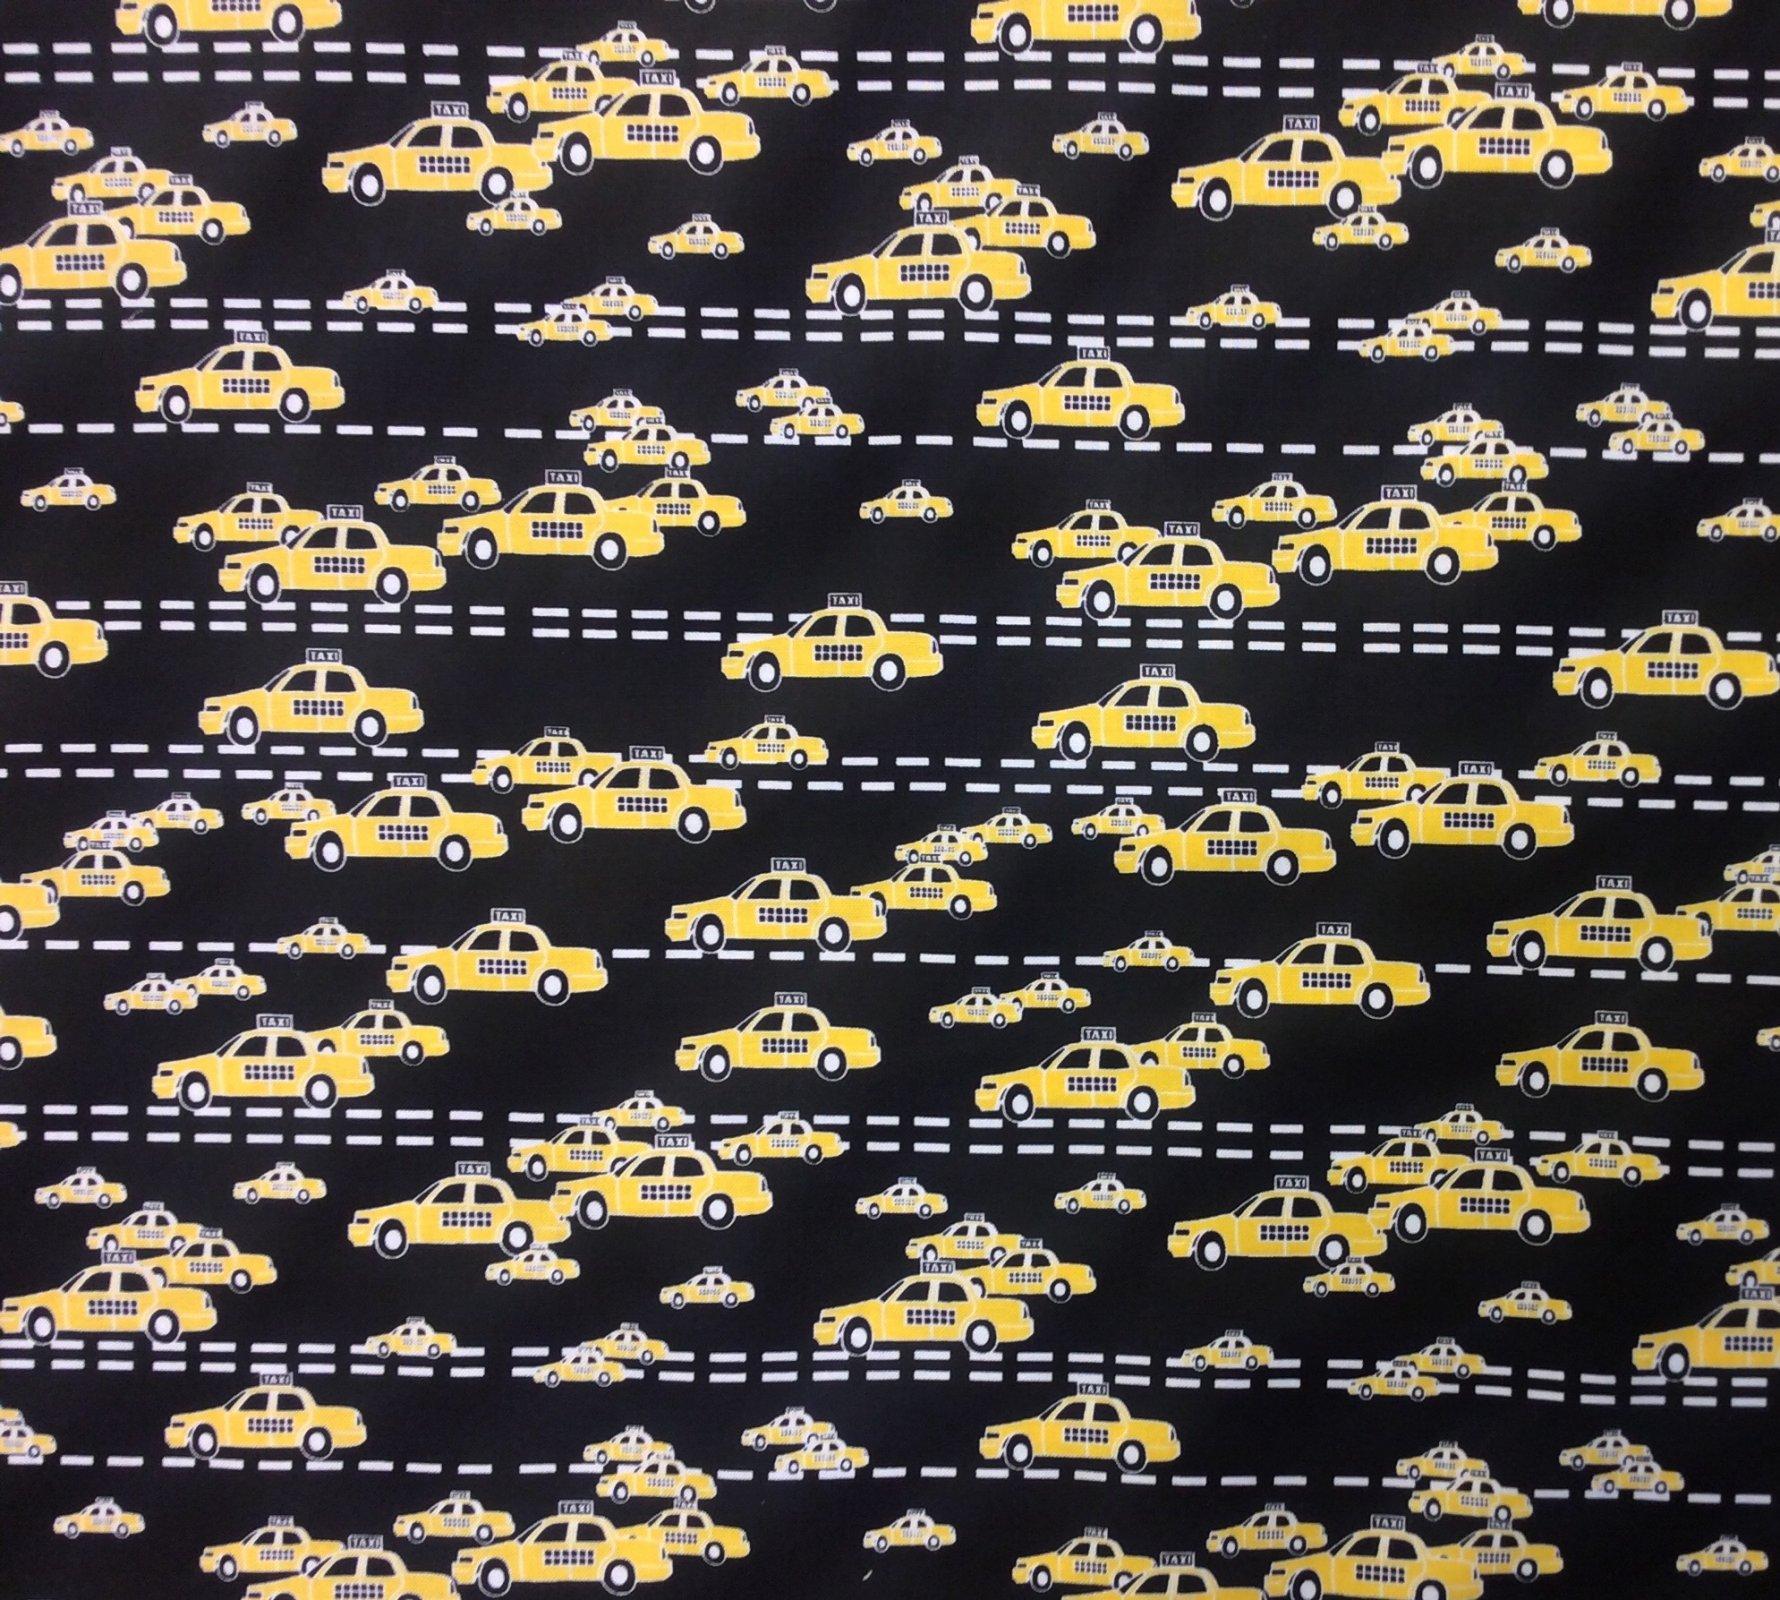 Taxi Cab City Car Service Yellow Cab New York City  Cotton Quilt Fabric TT08